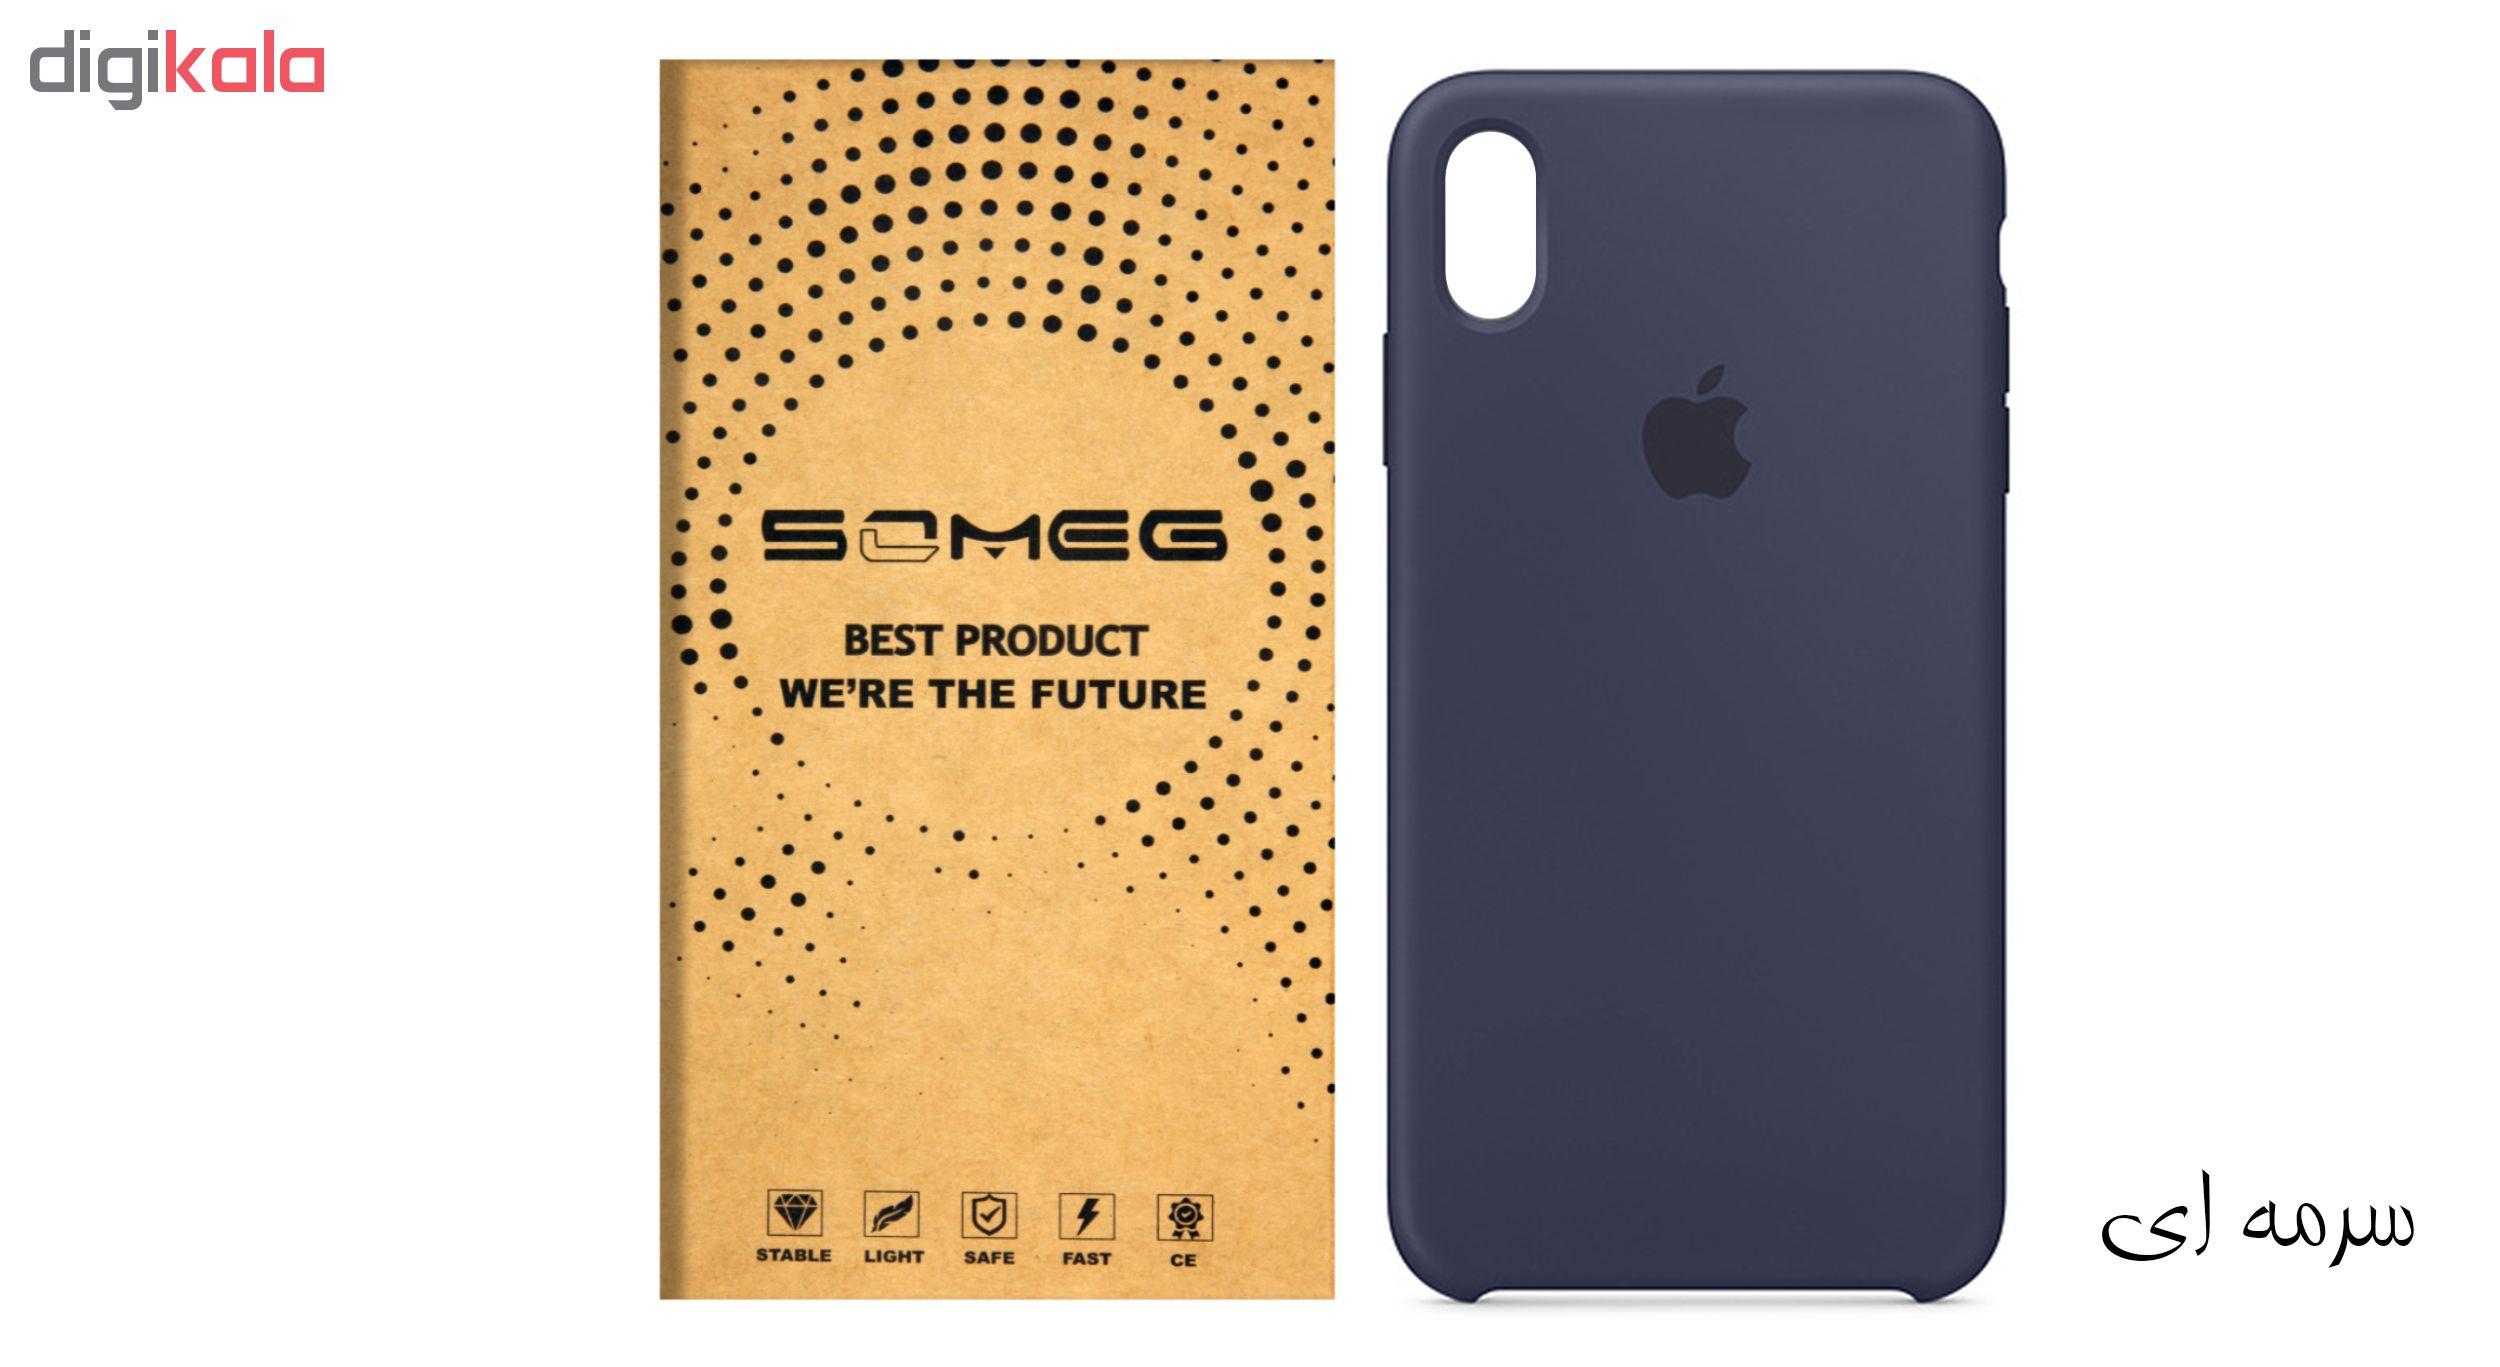 کاور سومگ مدل SIC مناسب برای گوشی موبایل اپل iPhone X  main 1 27